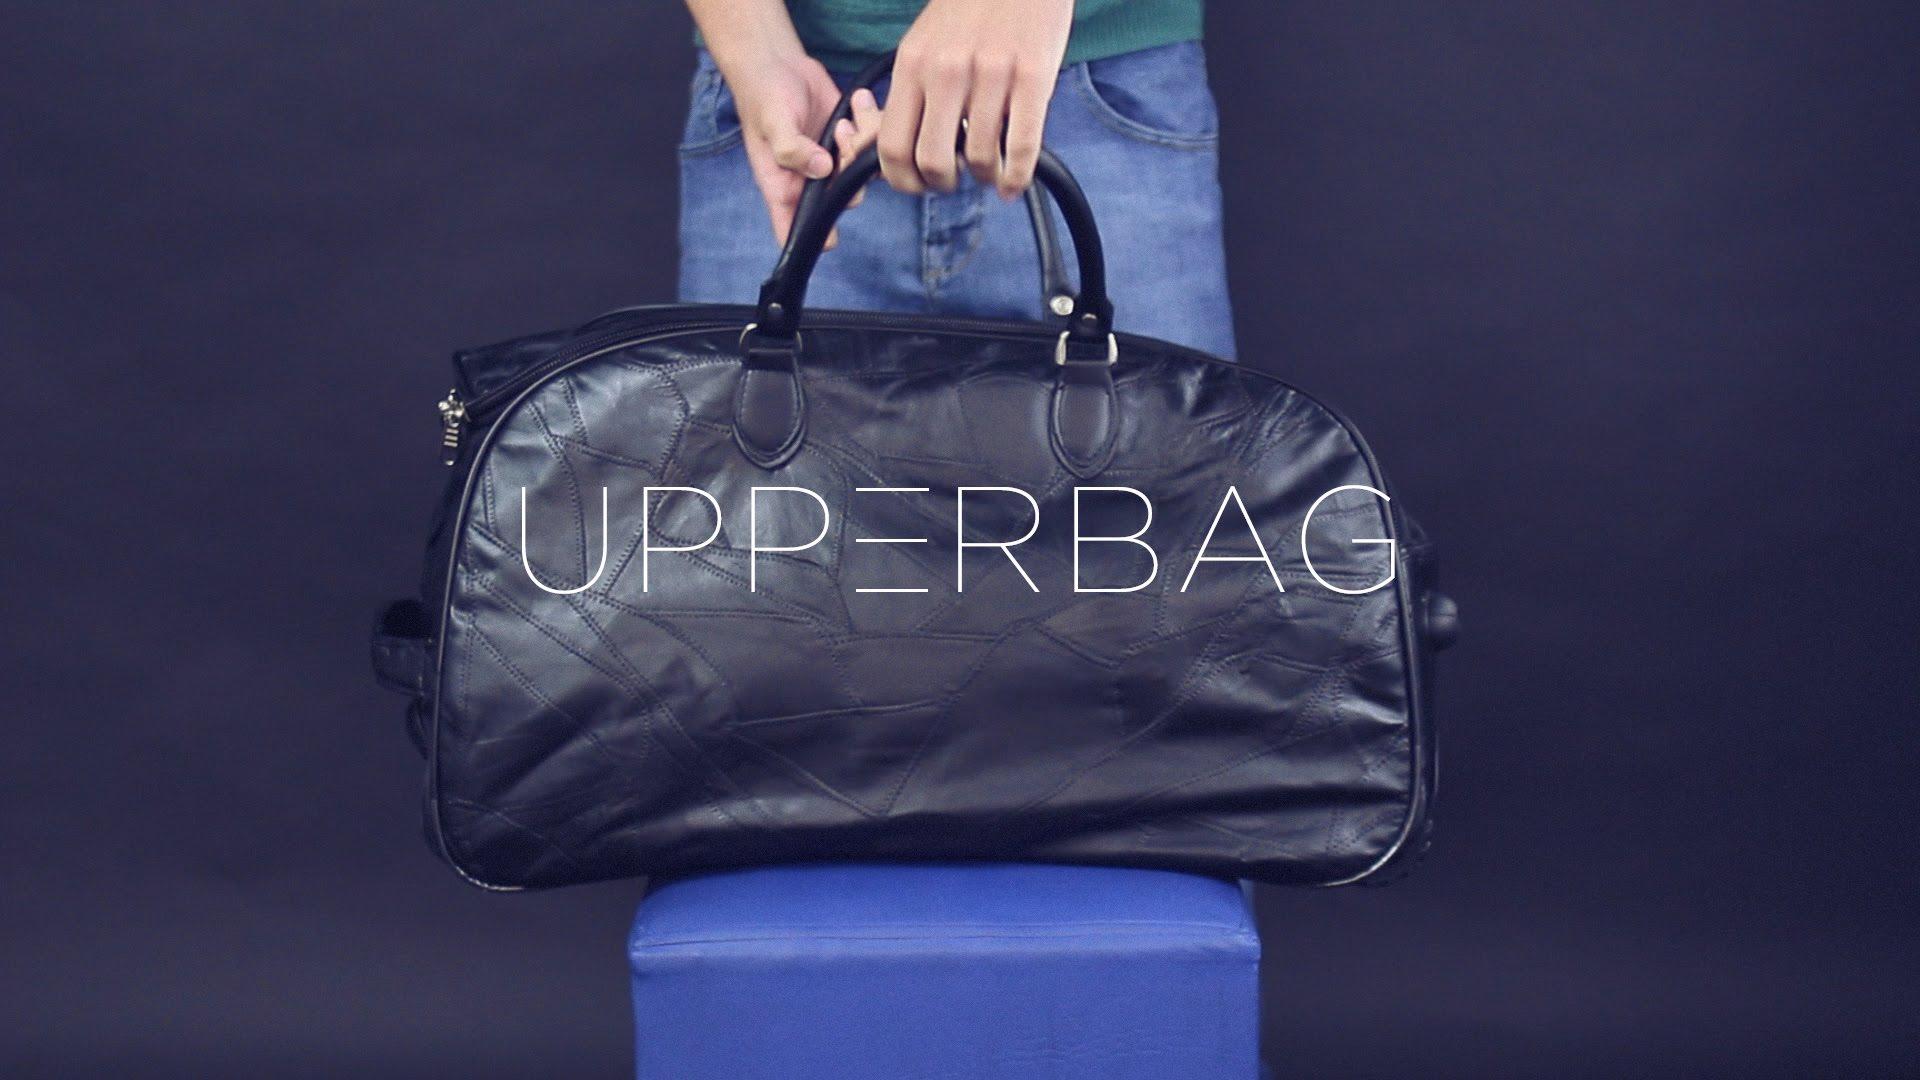 Upperbag